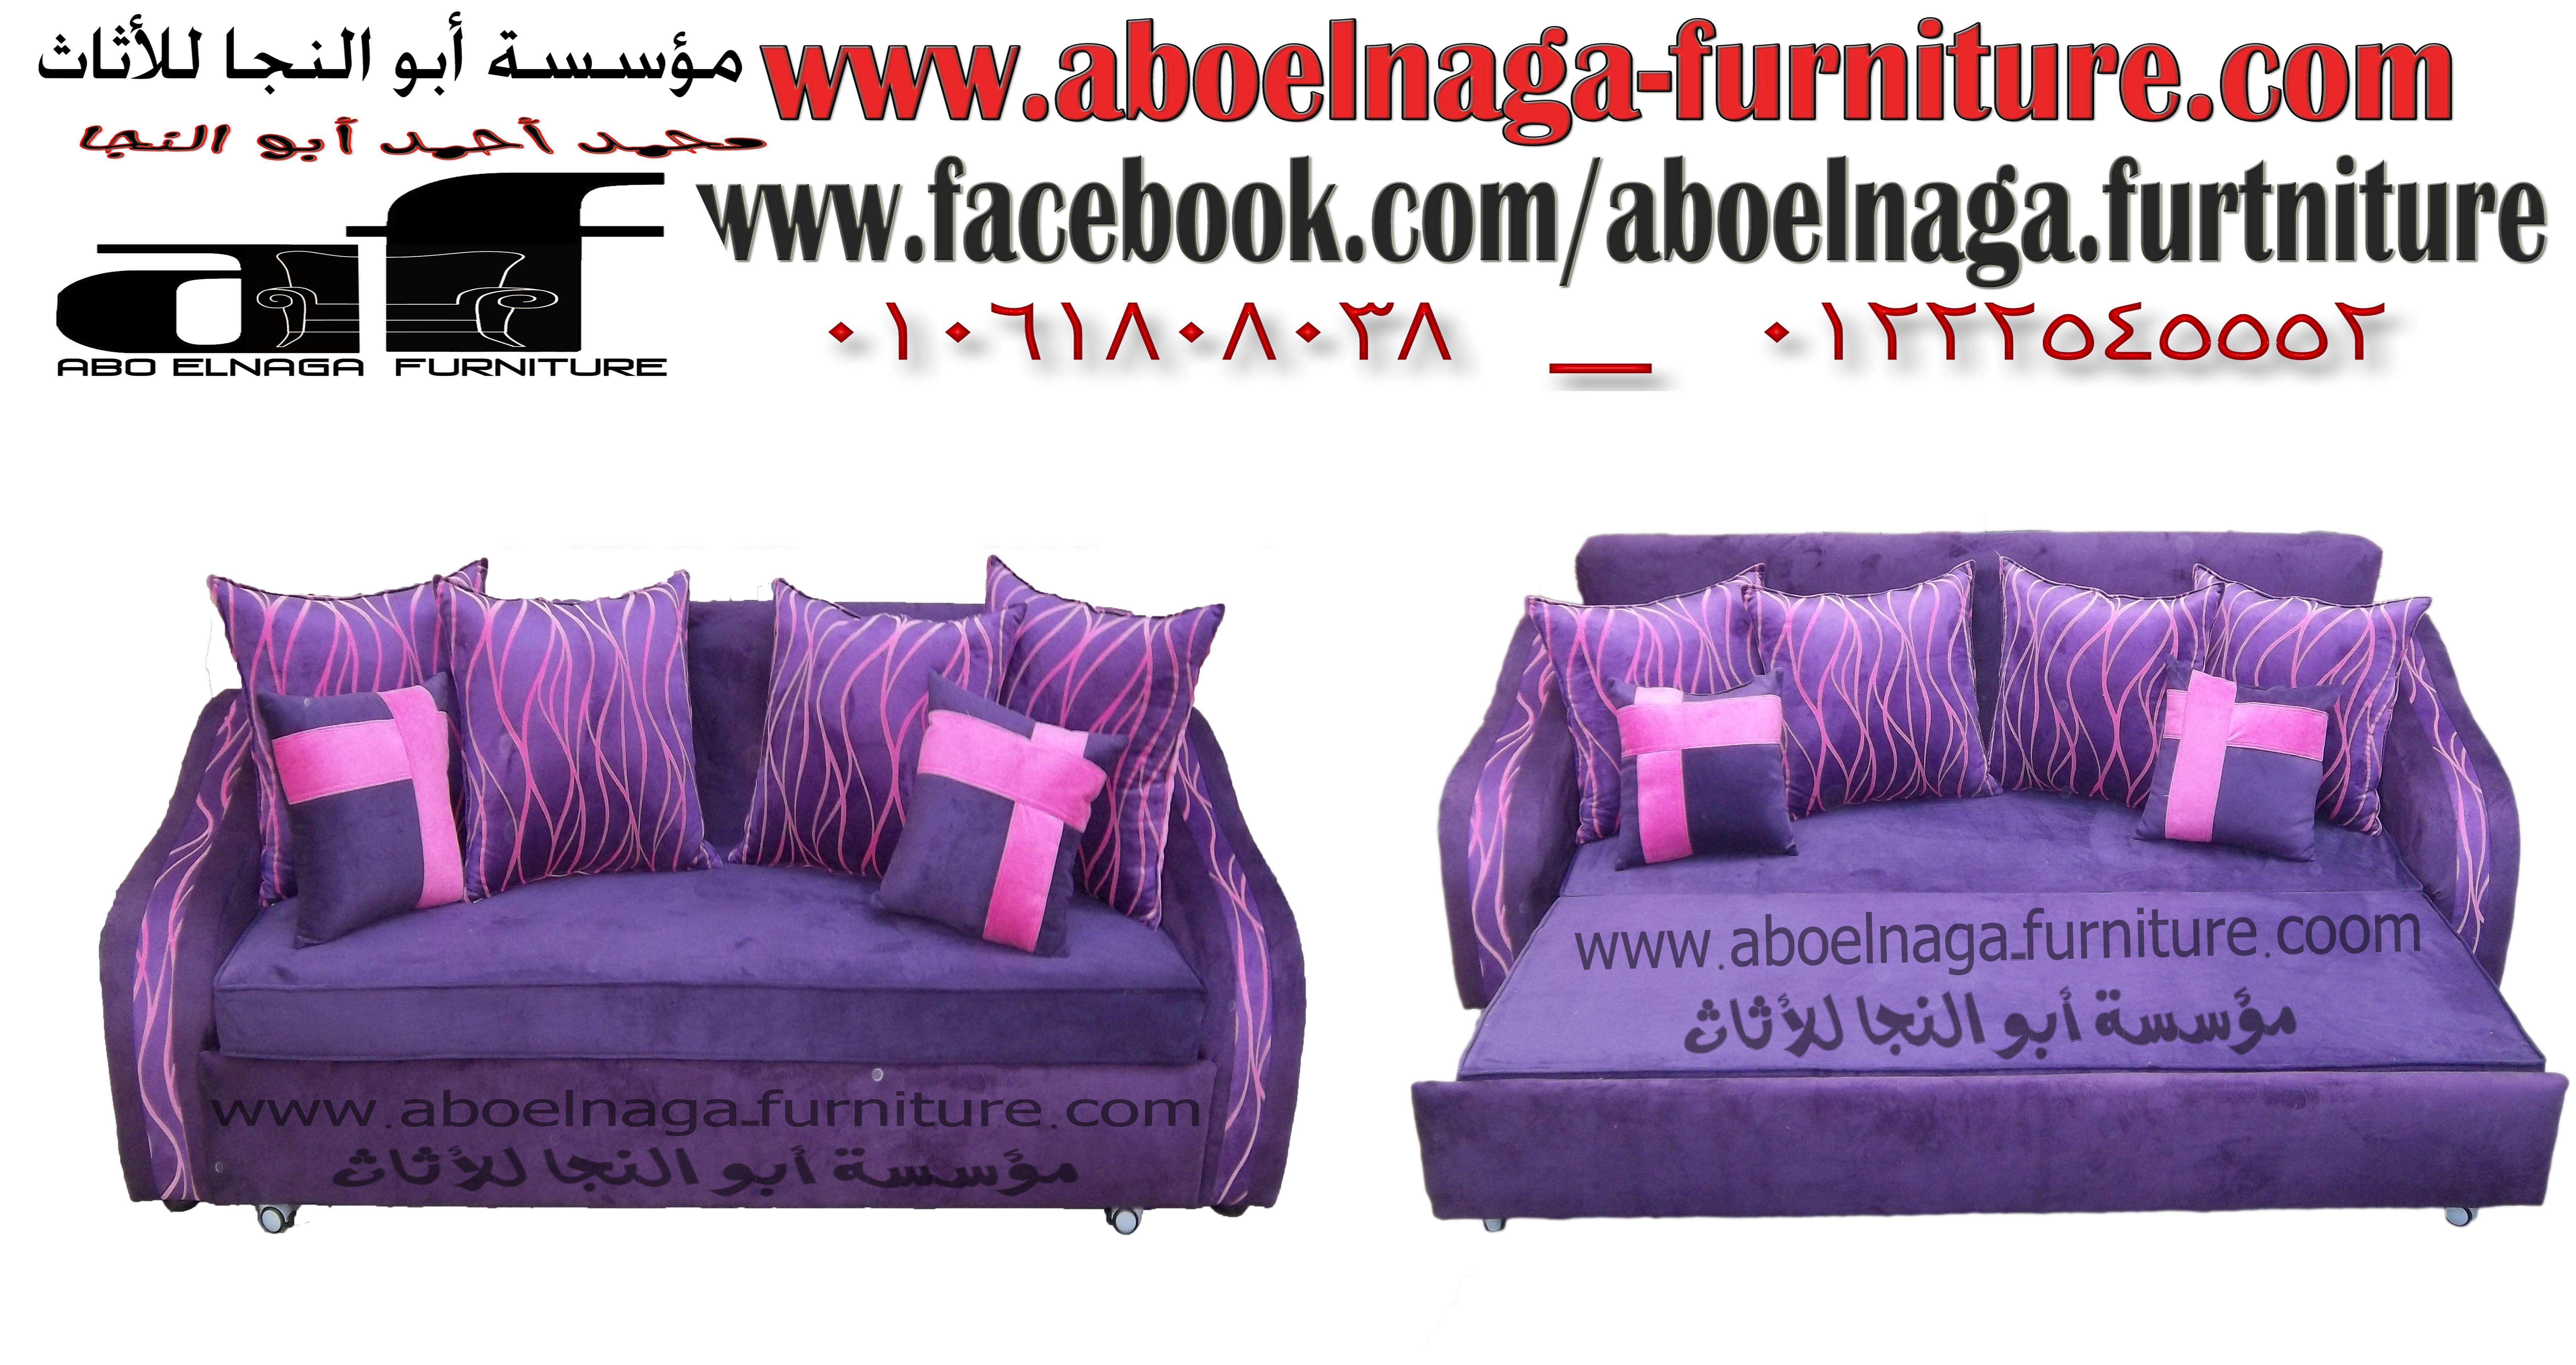 كنبه مودرن تفتح سرير متاح تنفيذها بمختلف المقاسات و الأشكال Www Aboelnaga Furniture Com Www Twitter Com Aboelnagafurnit Www Pinterest Com Aboelnagafurnit W